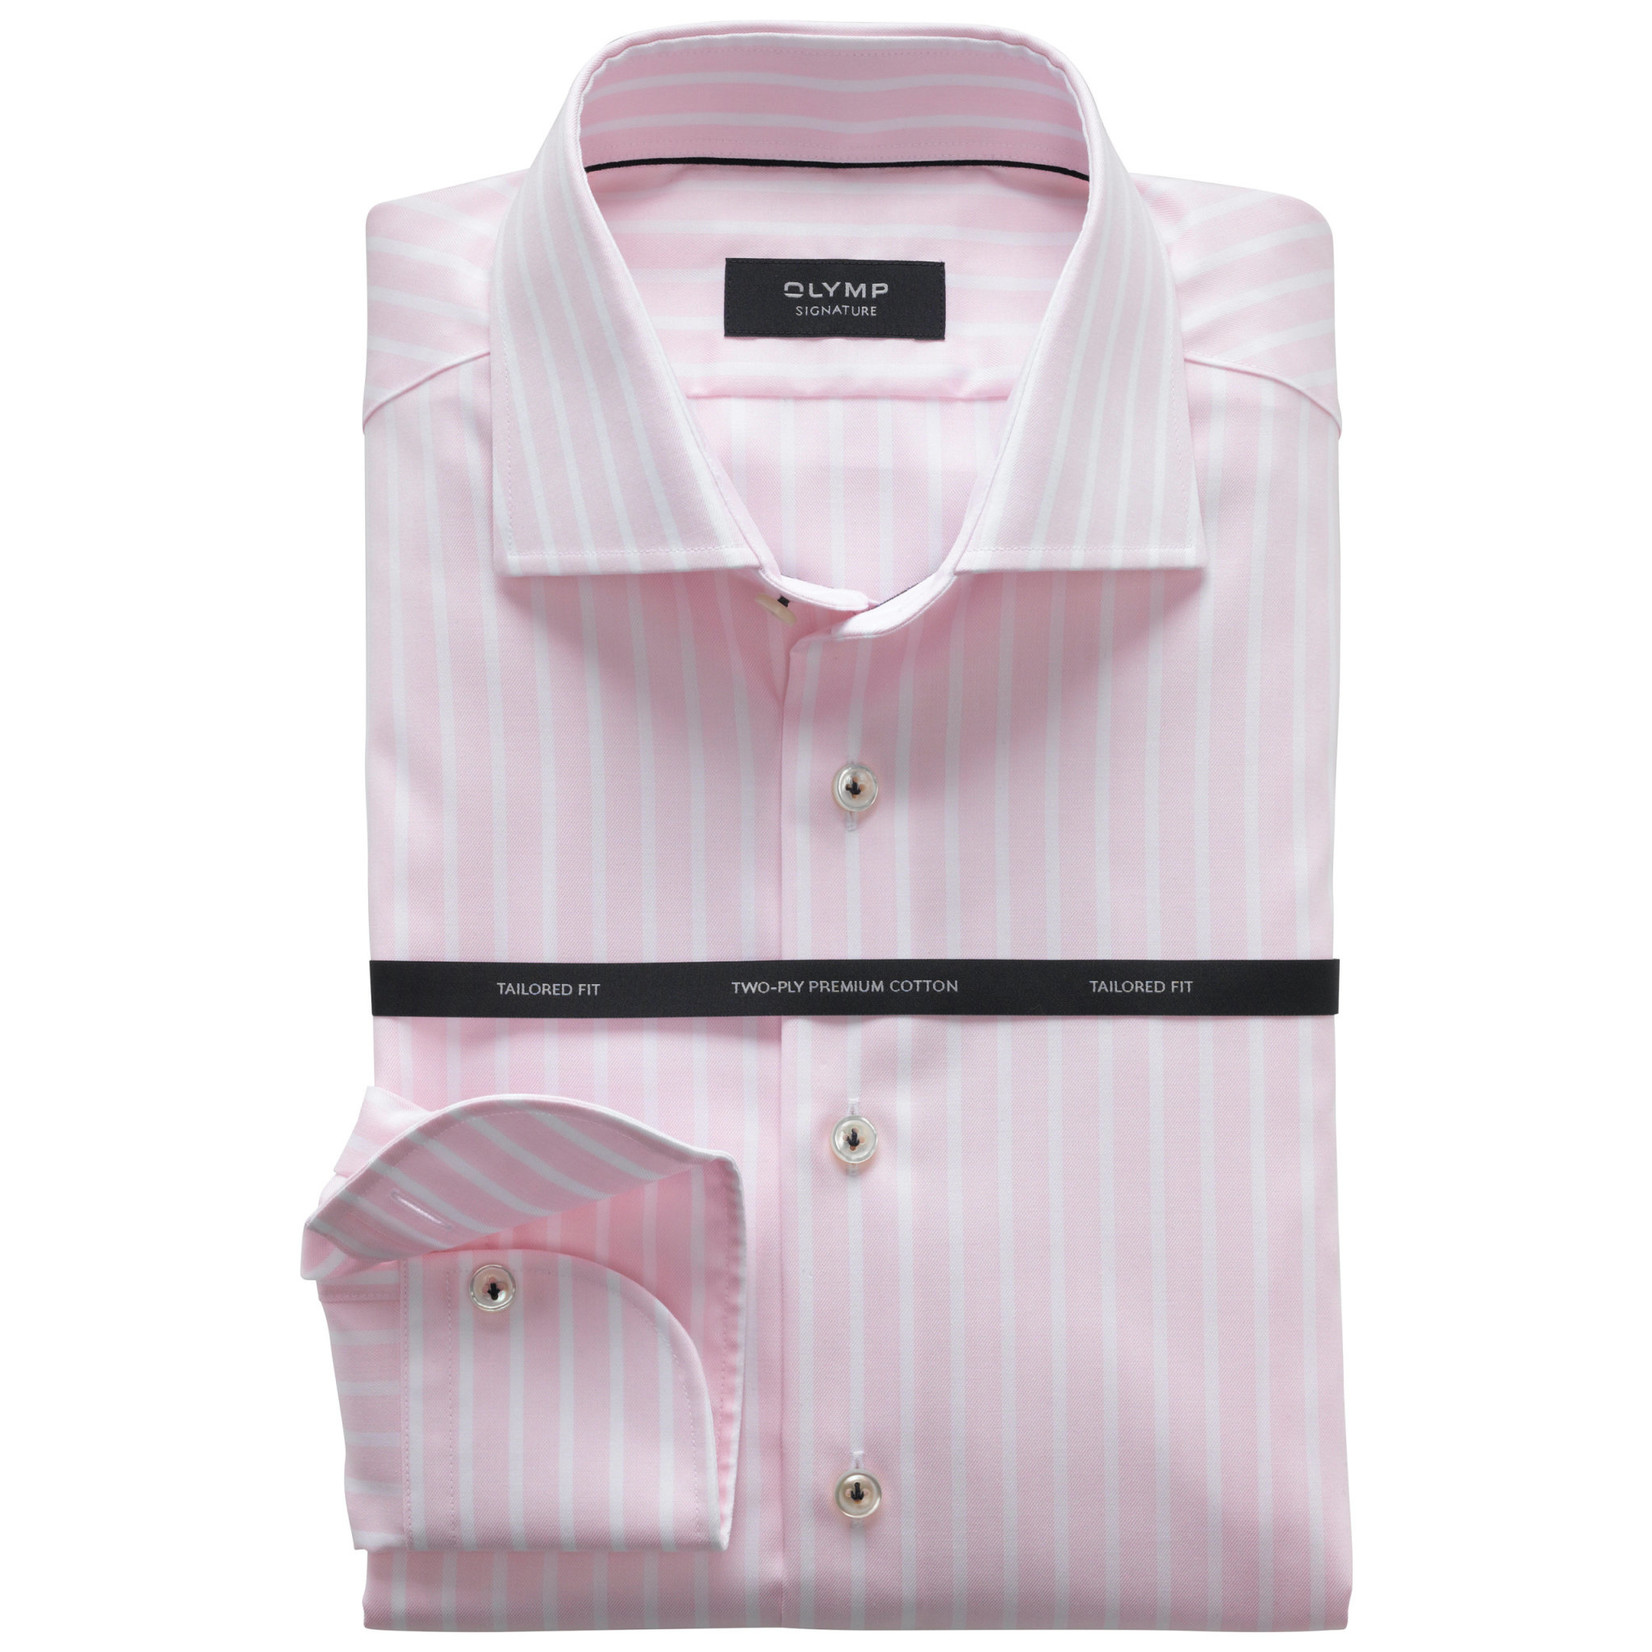 Olymp Signature tailored fit overhemd roze streep